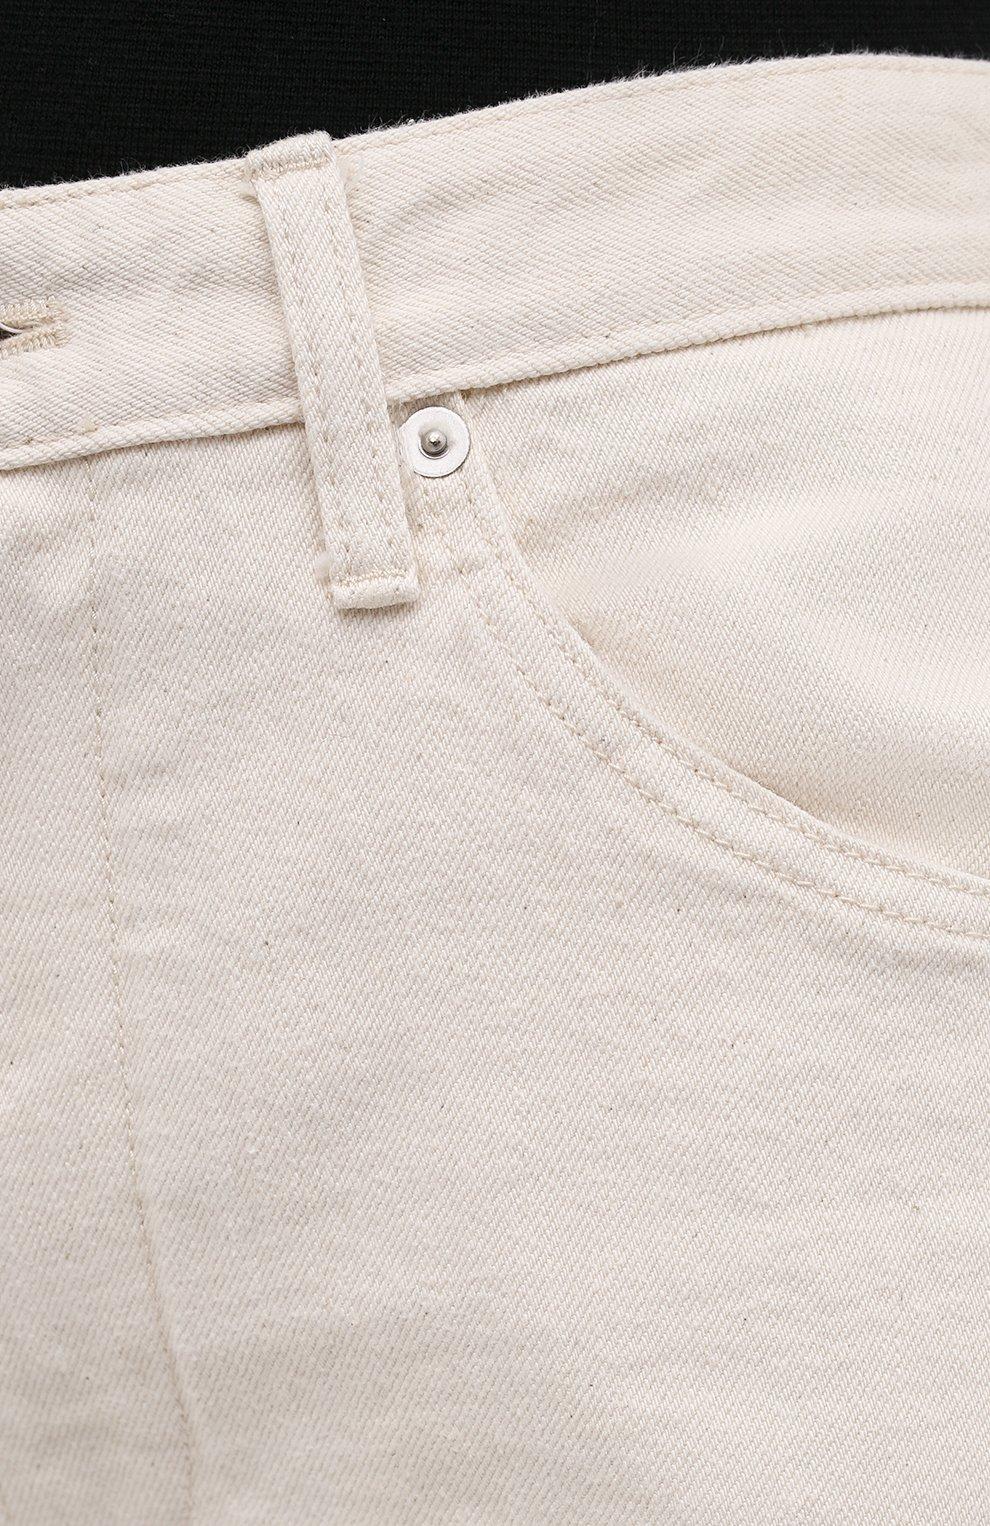 Женские джинсы JIL SANDER бежевого цвета, арт. JPPS663107-WS246500 | Фото 5